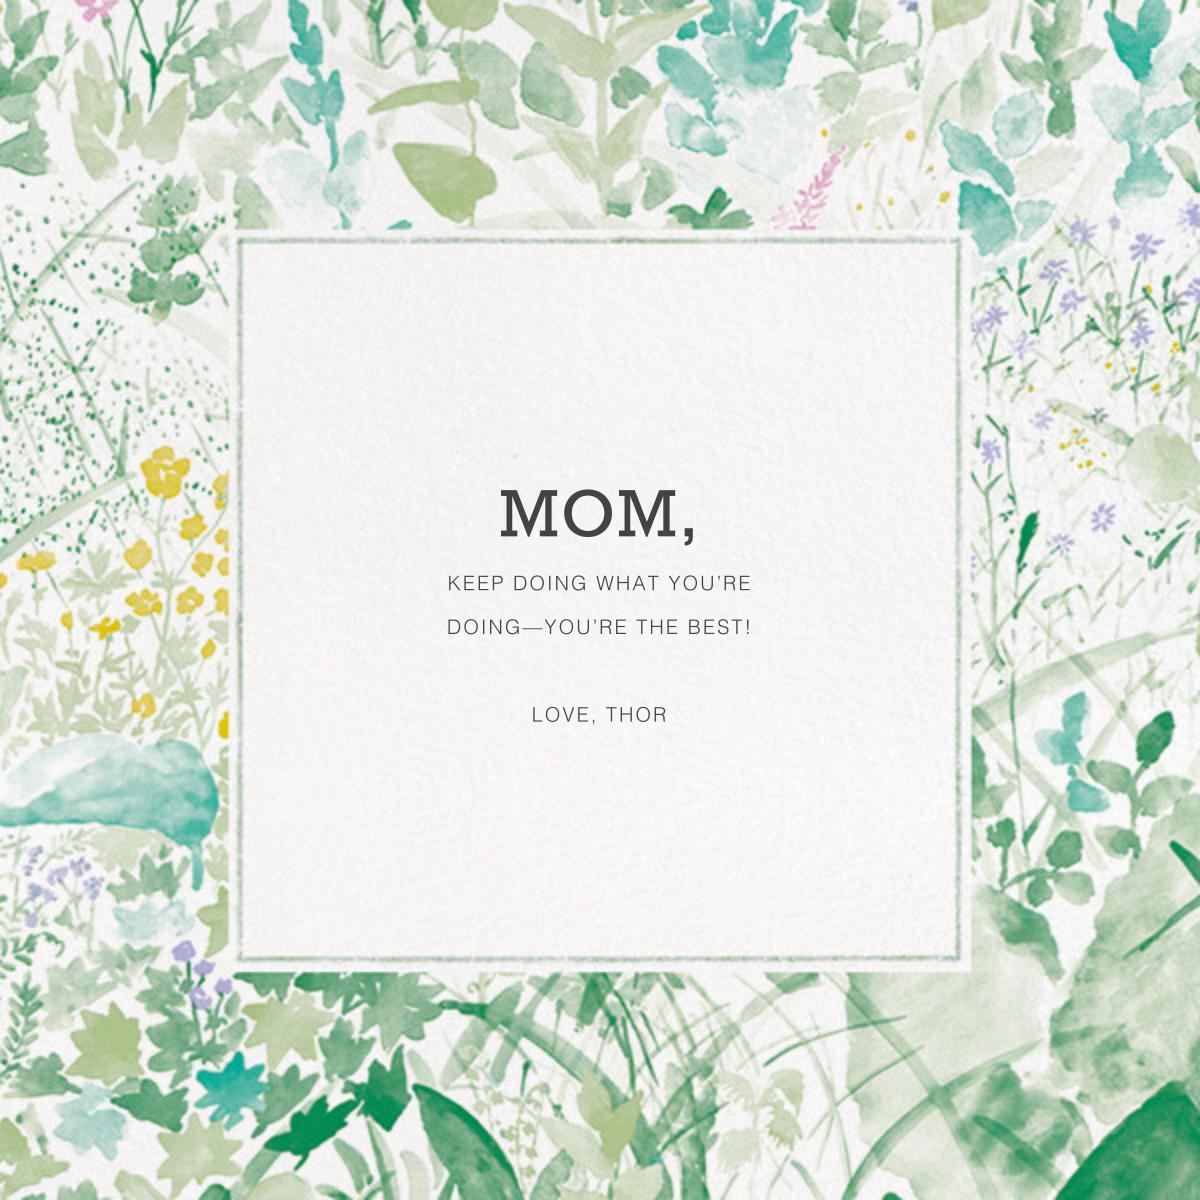 Kesanto (Square) - Marimekko - Mother's Day